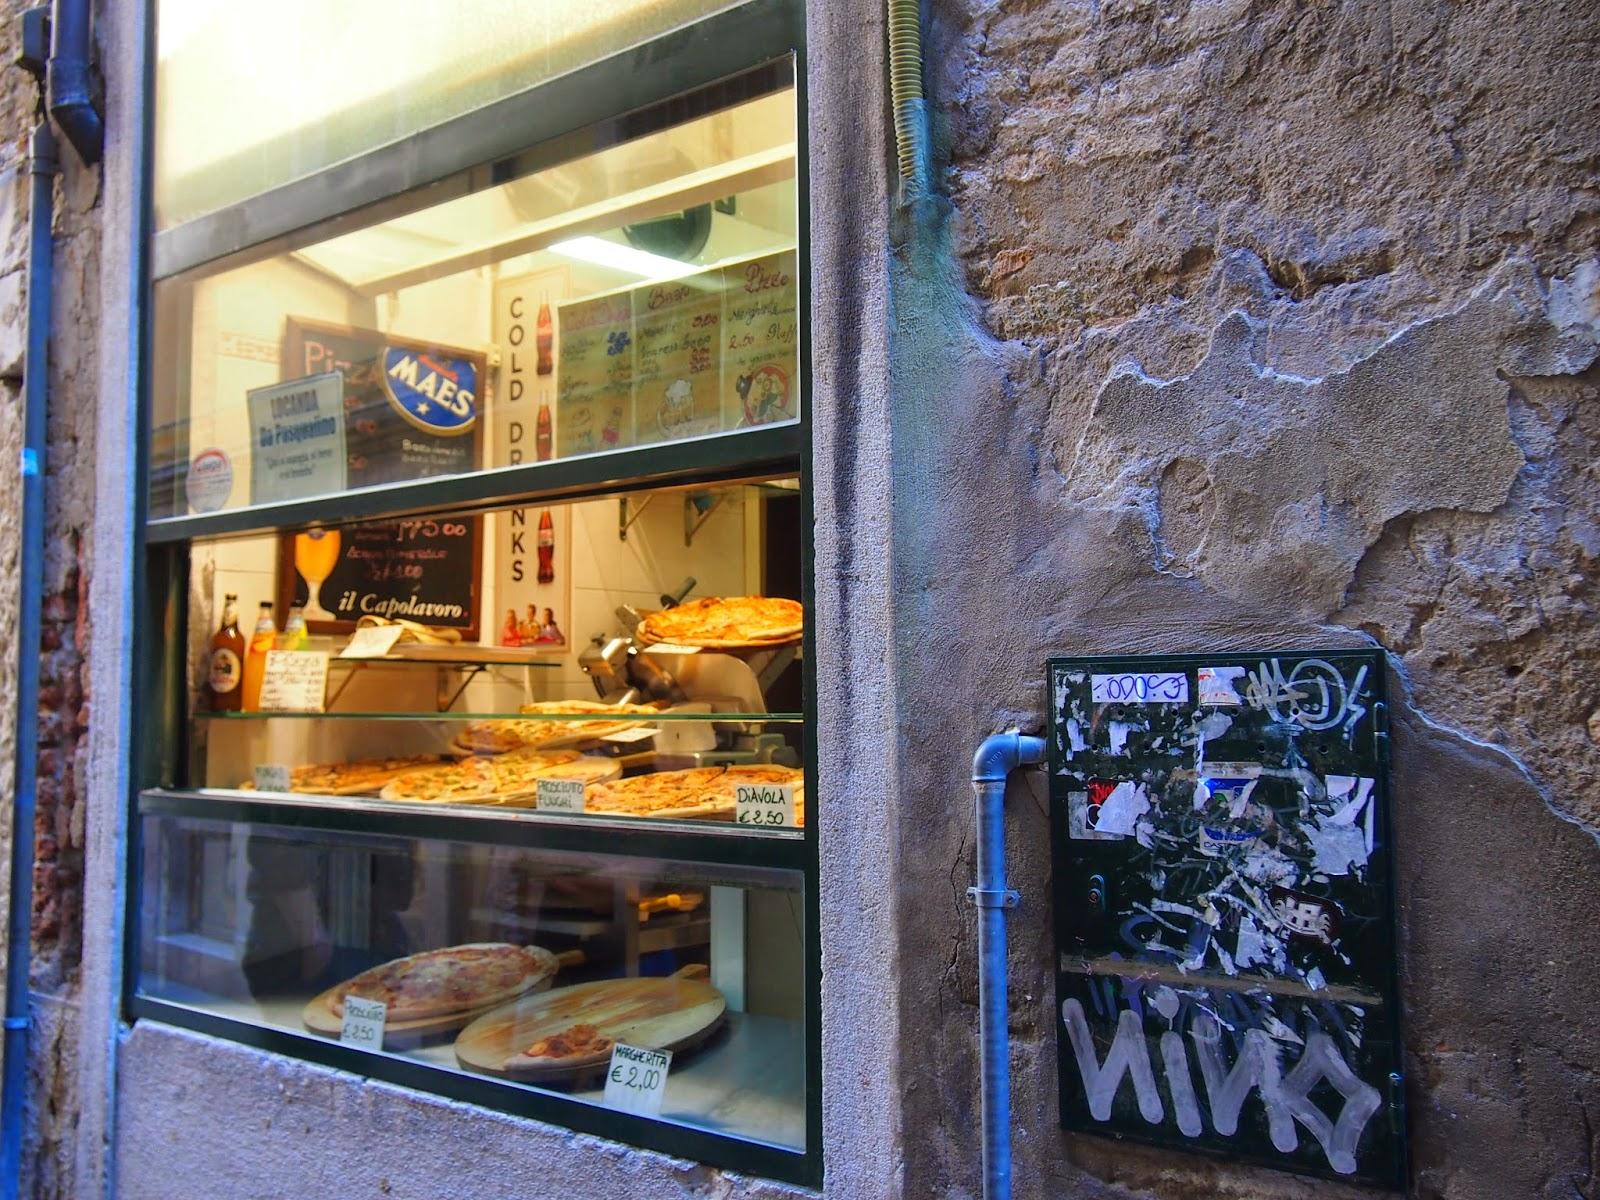 Window pizza shop in Venice